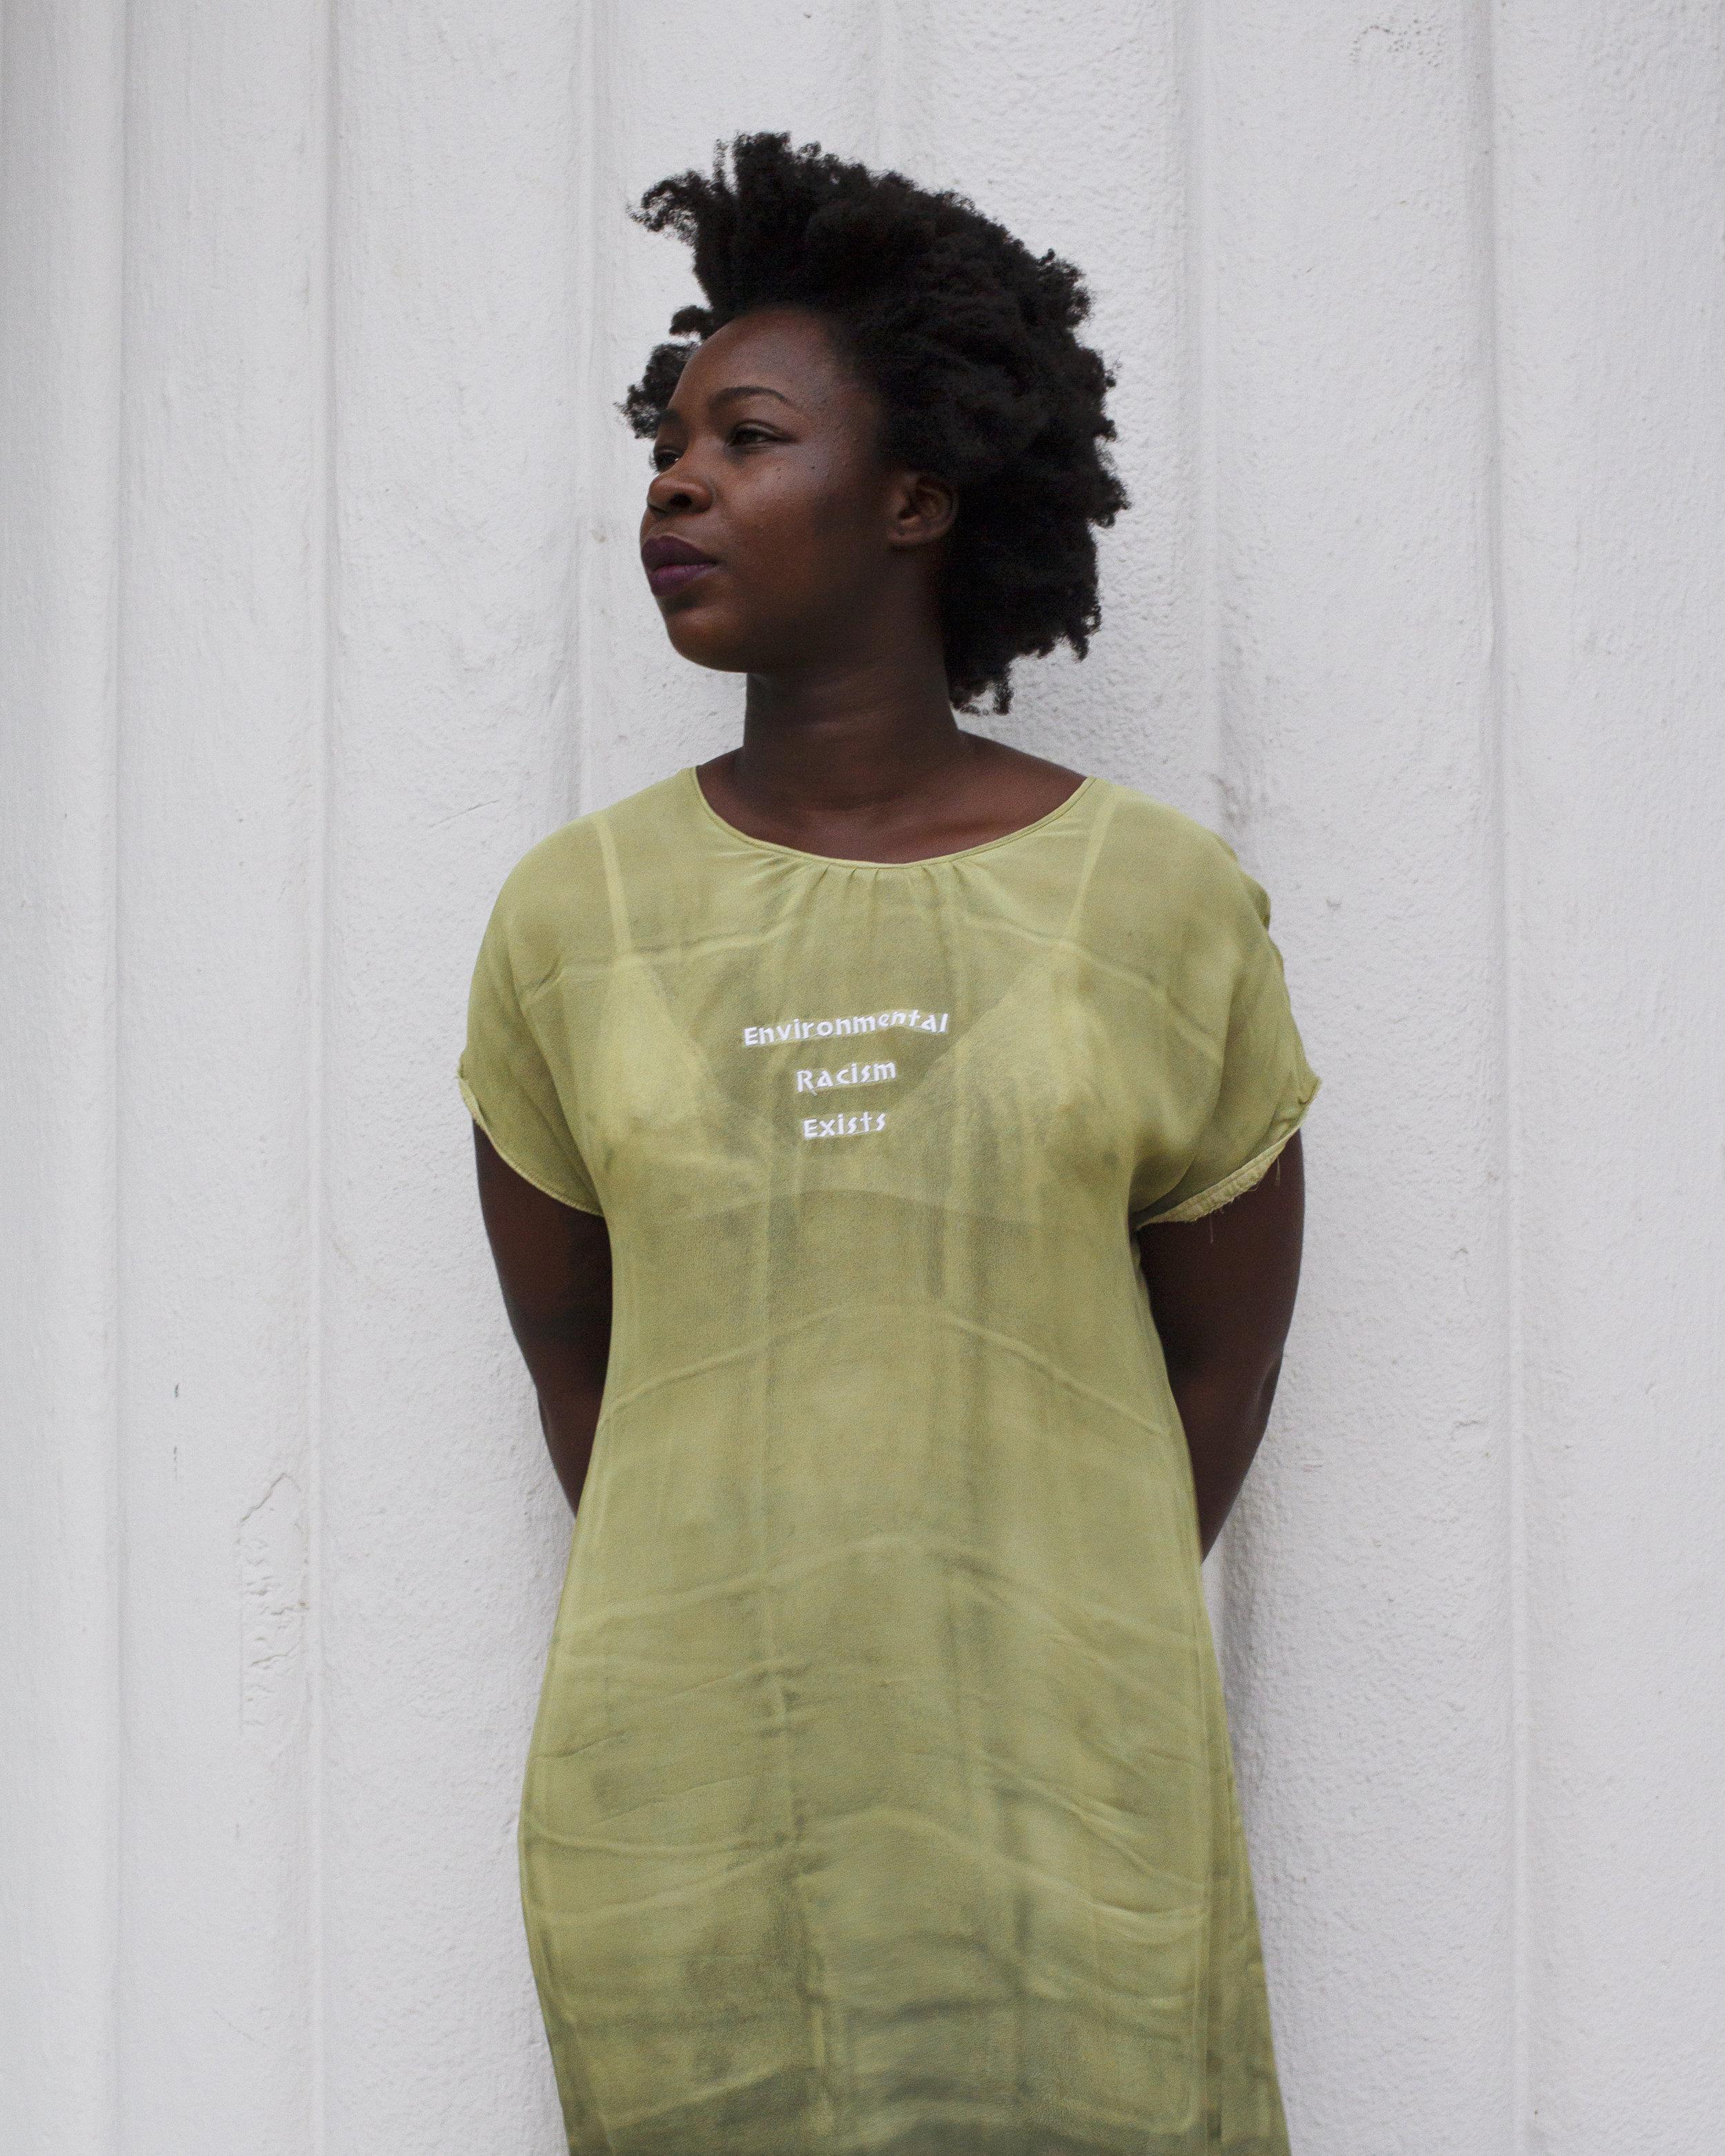 Environmental Racism Exists - Dress